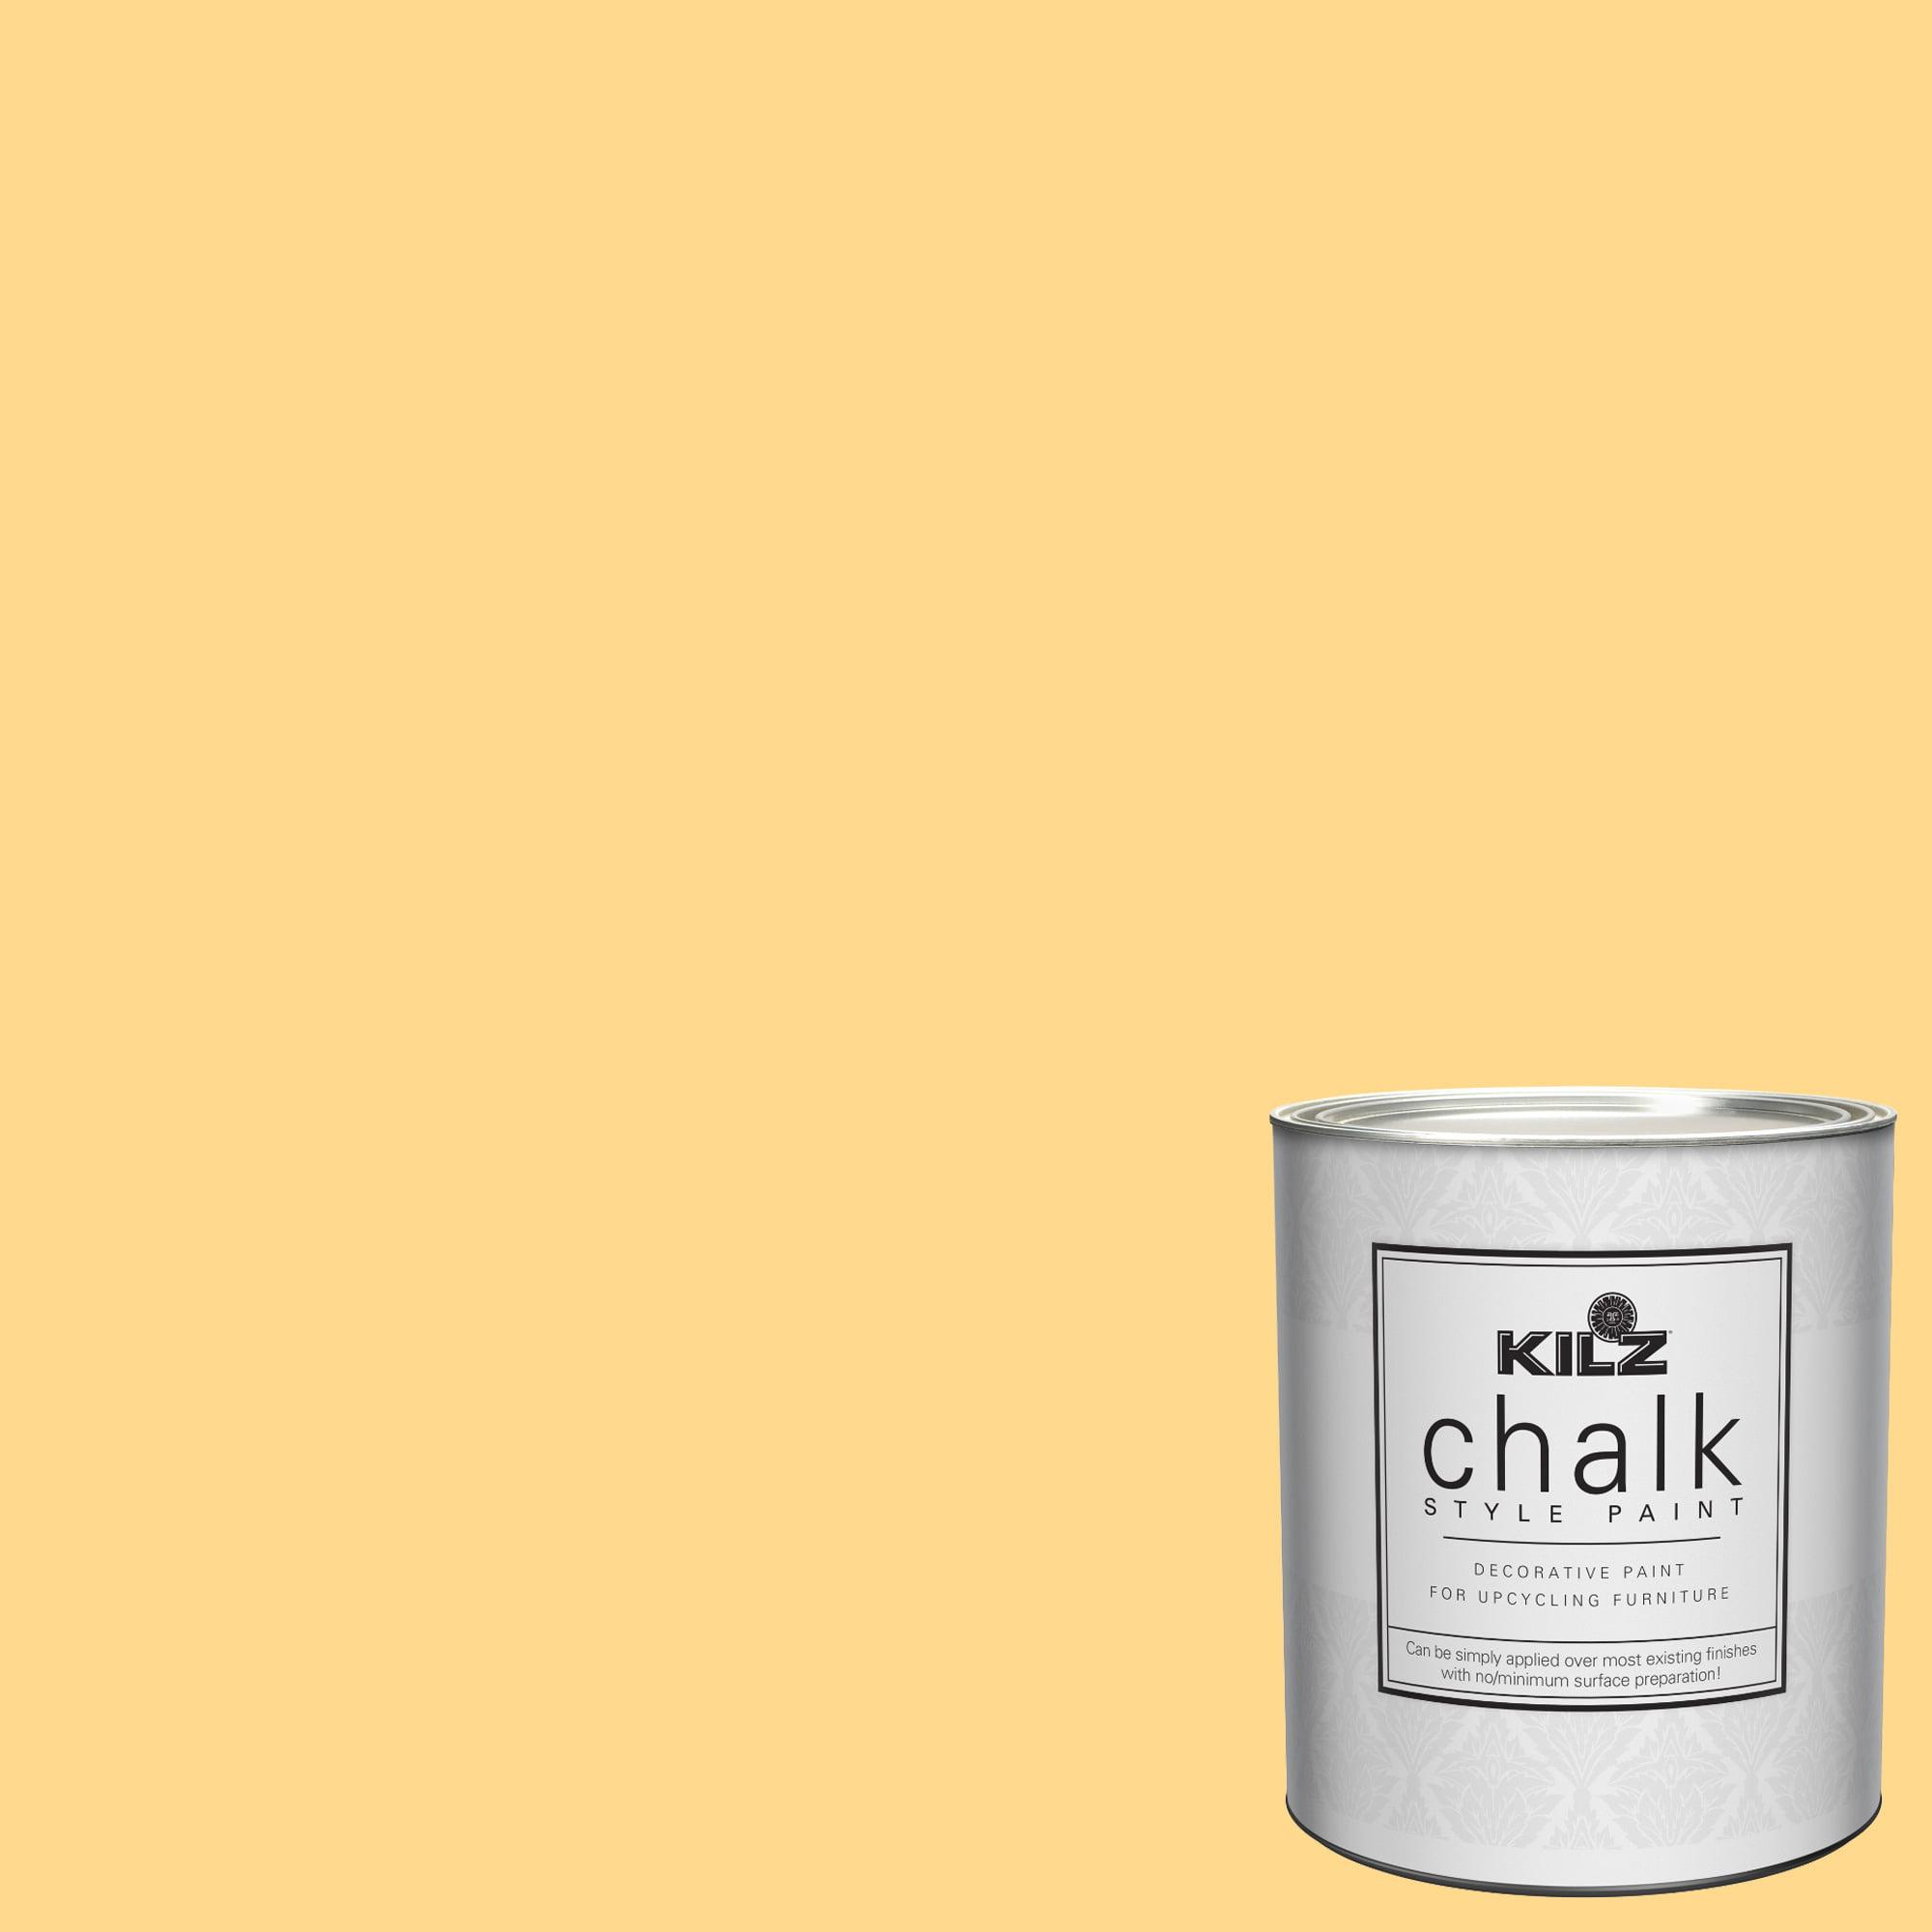 KILZ Chalk Style Decorative Paint, 1 quart by Masterchem Industries LLC